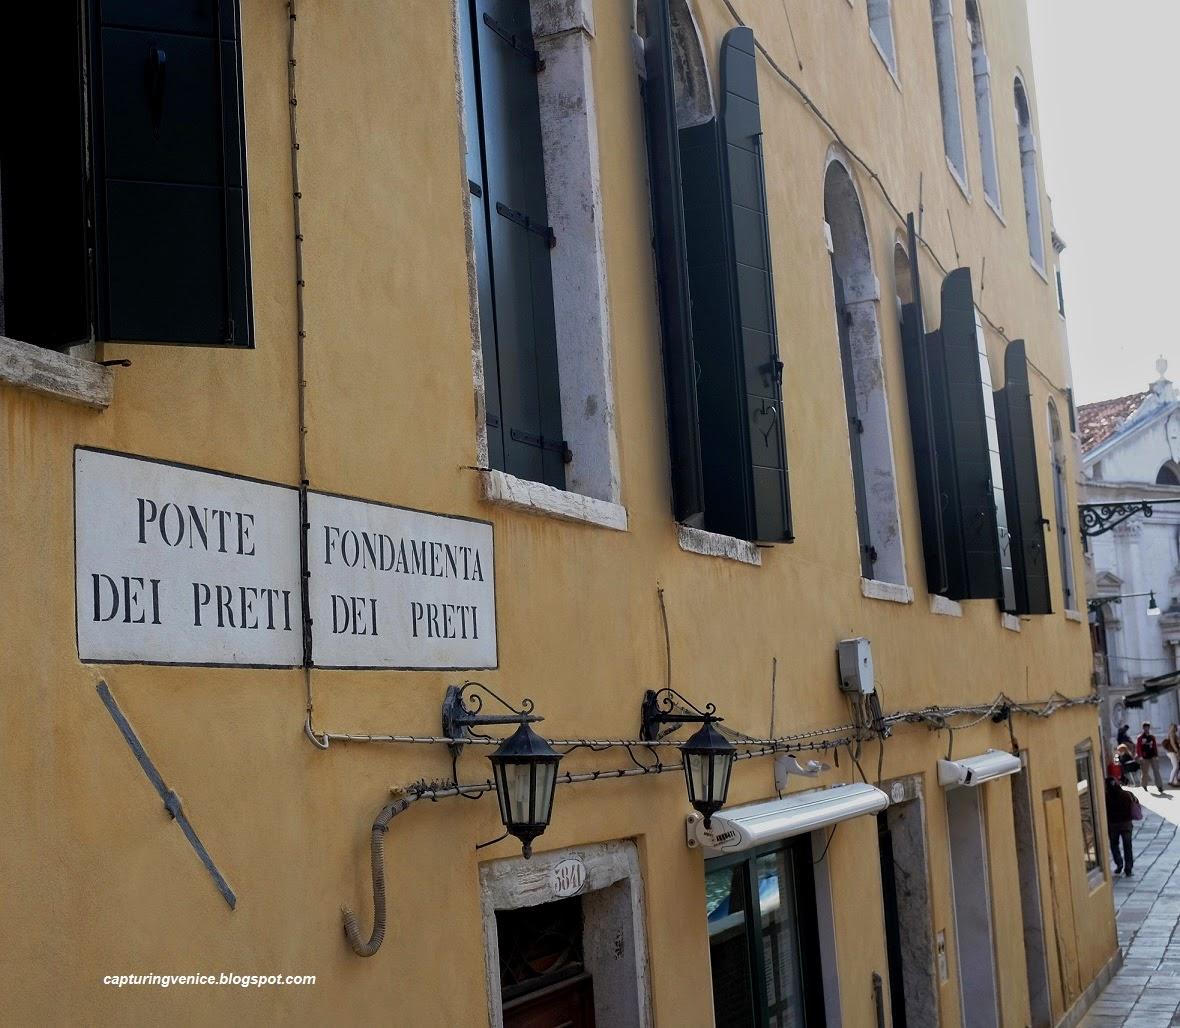 Calle del Paradiso Venice capturingvenice.blogspot.com